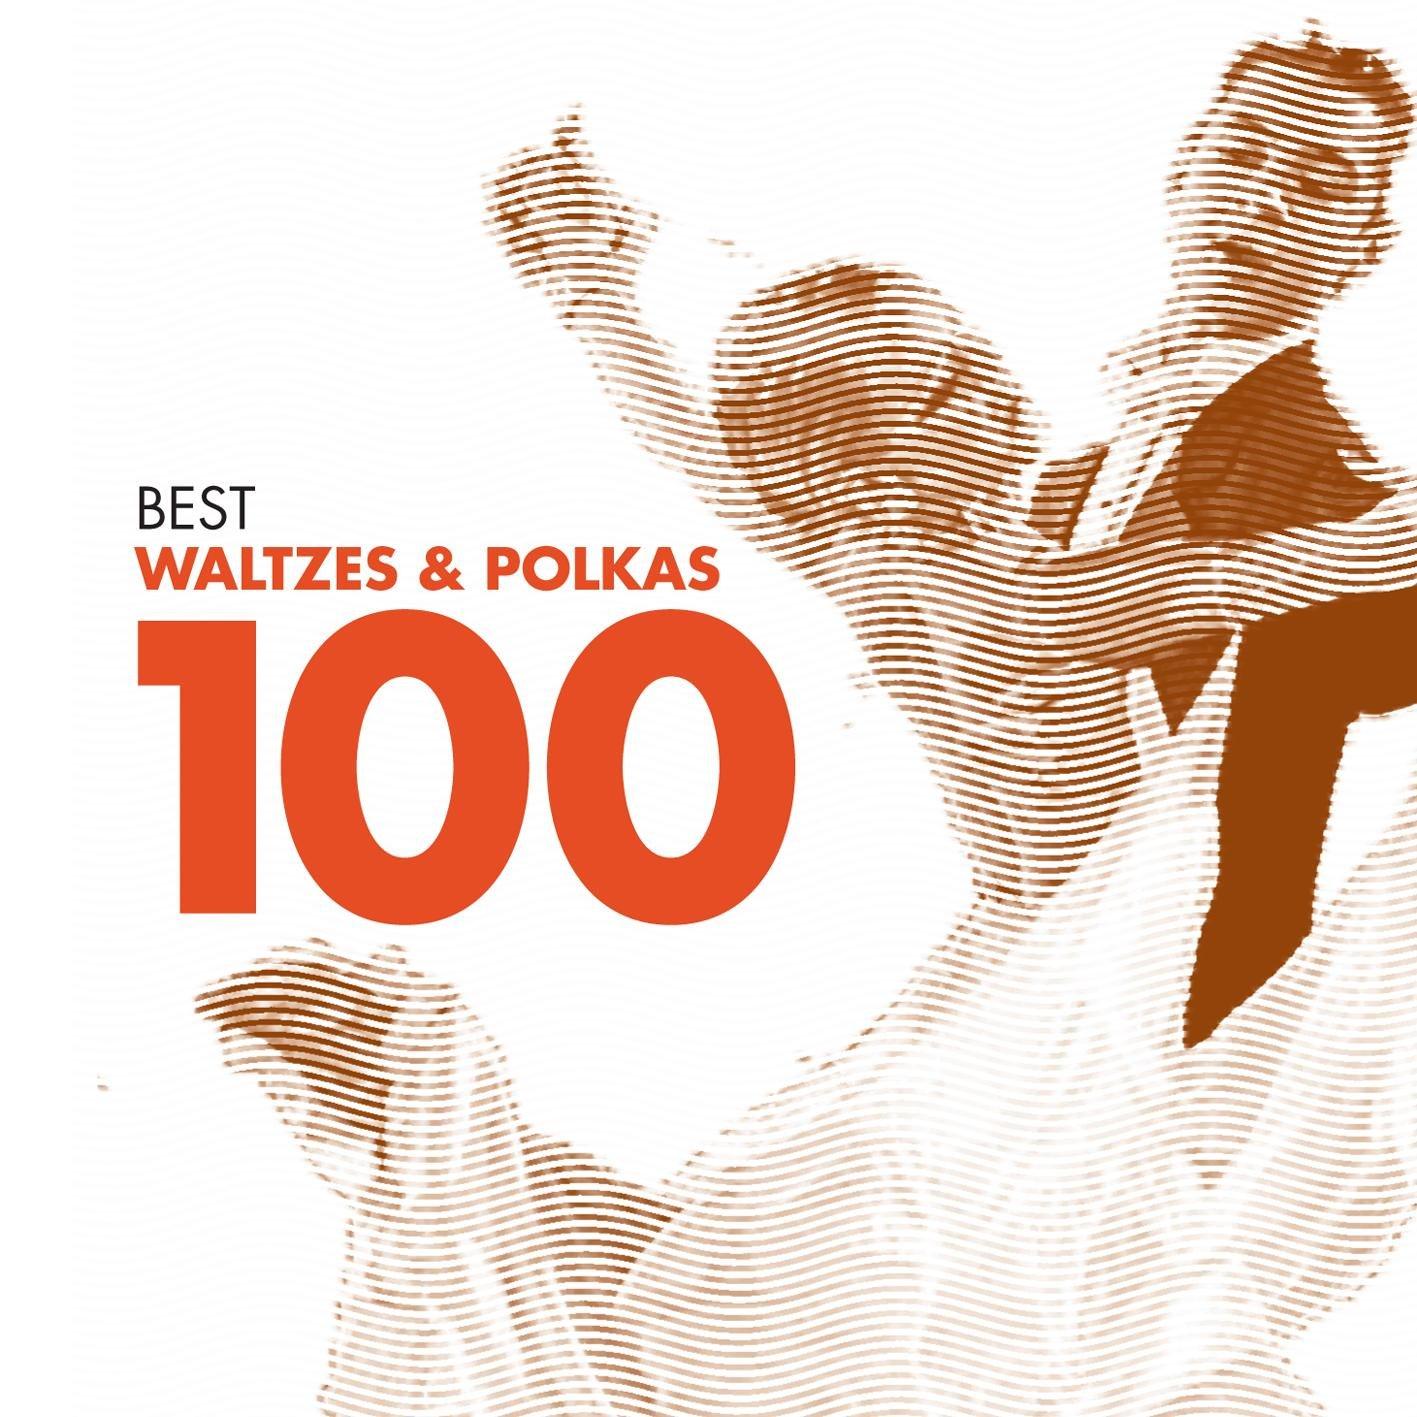 Best Waltzes & Polkas 100 by Alliance